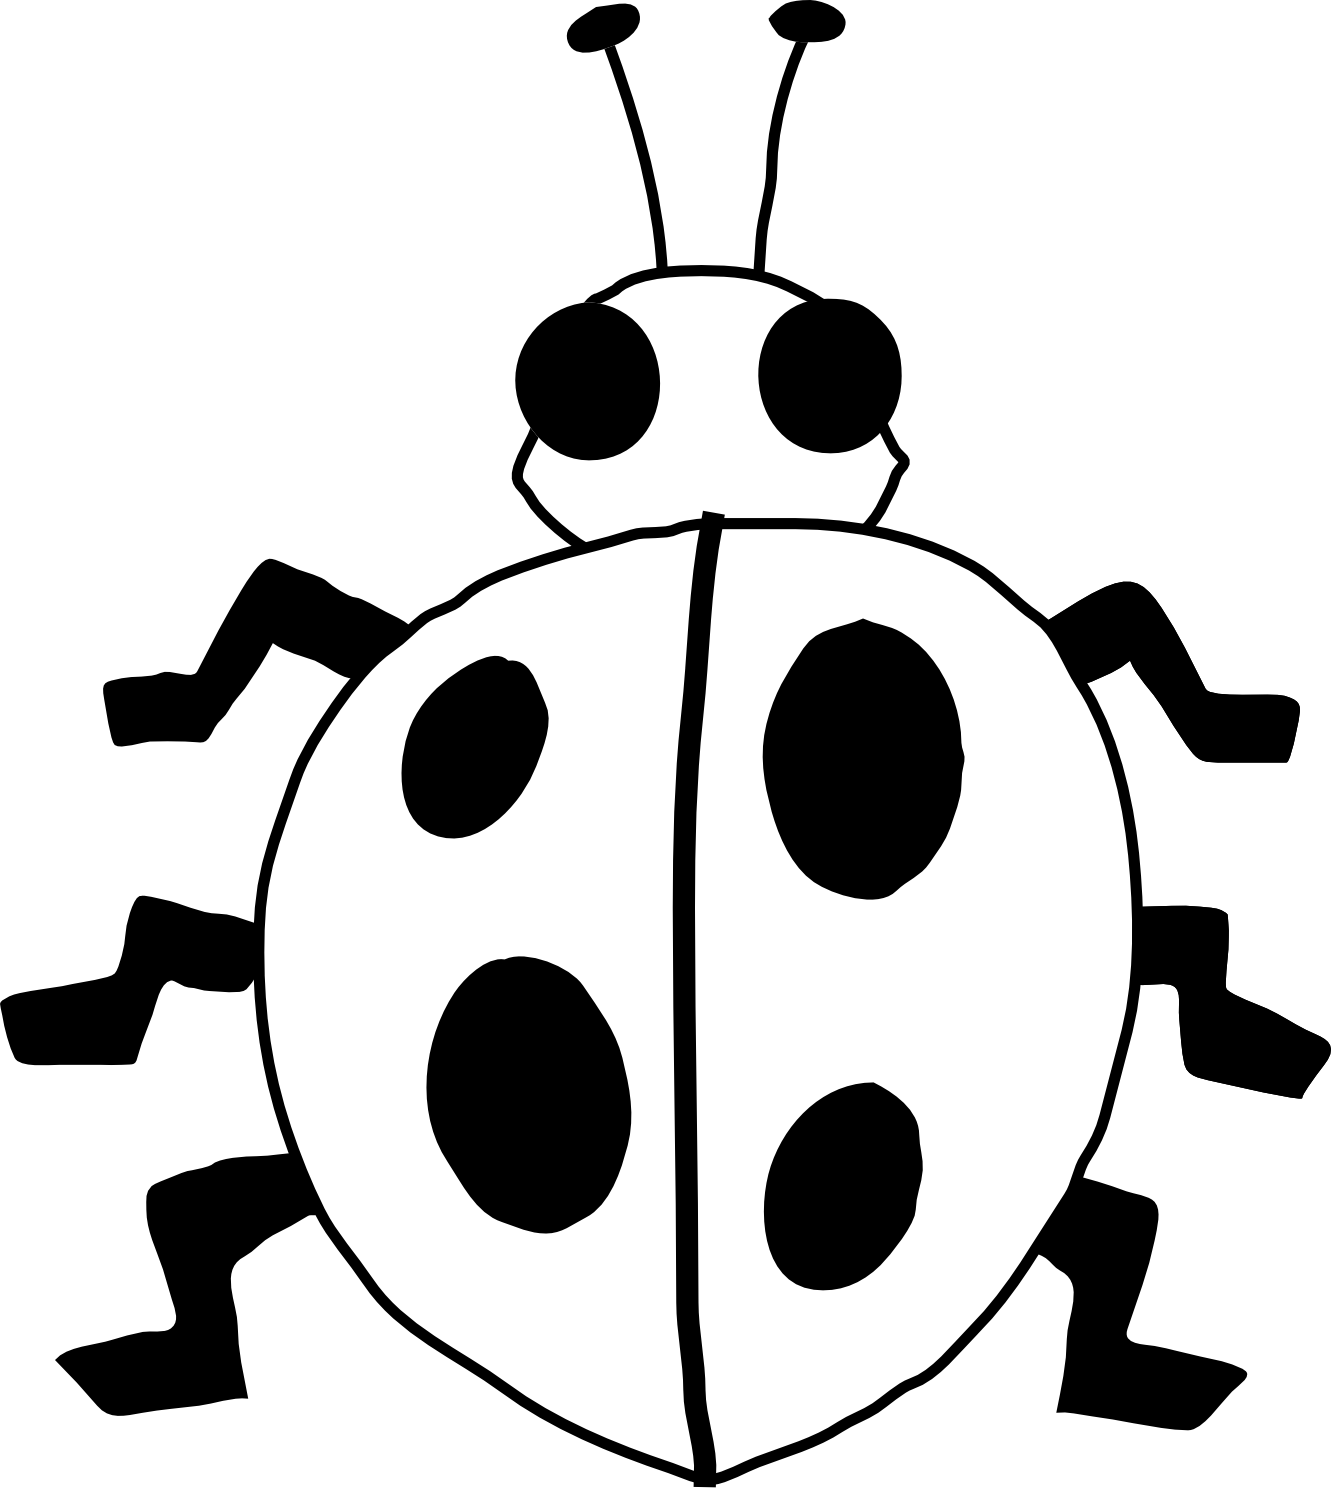 1331x1488 Clip Art Flower Black And White Clipart Panda